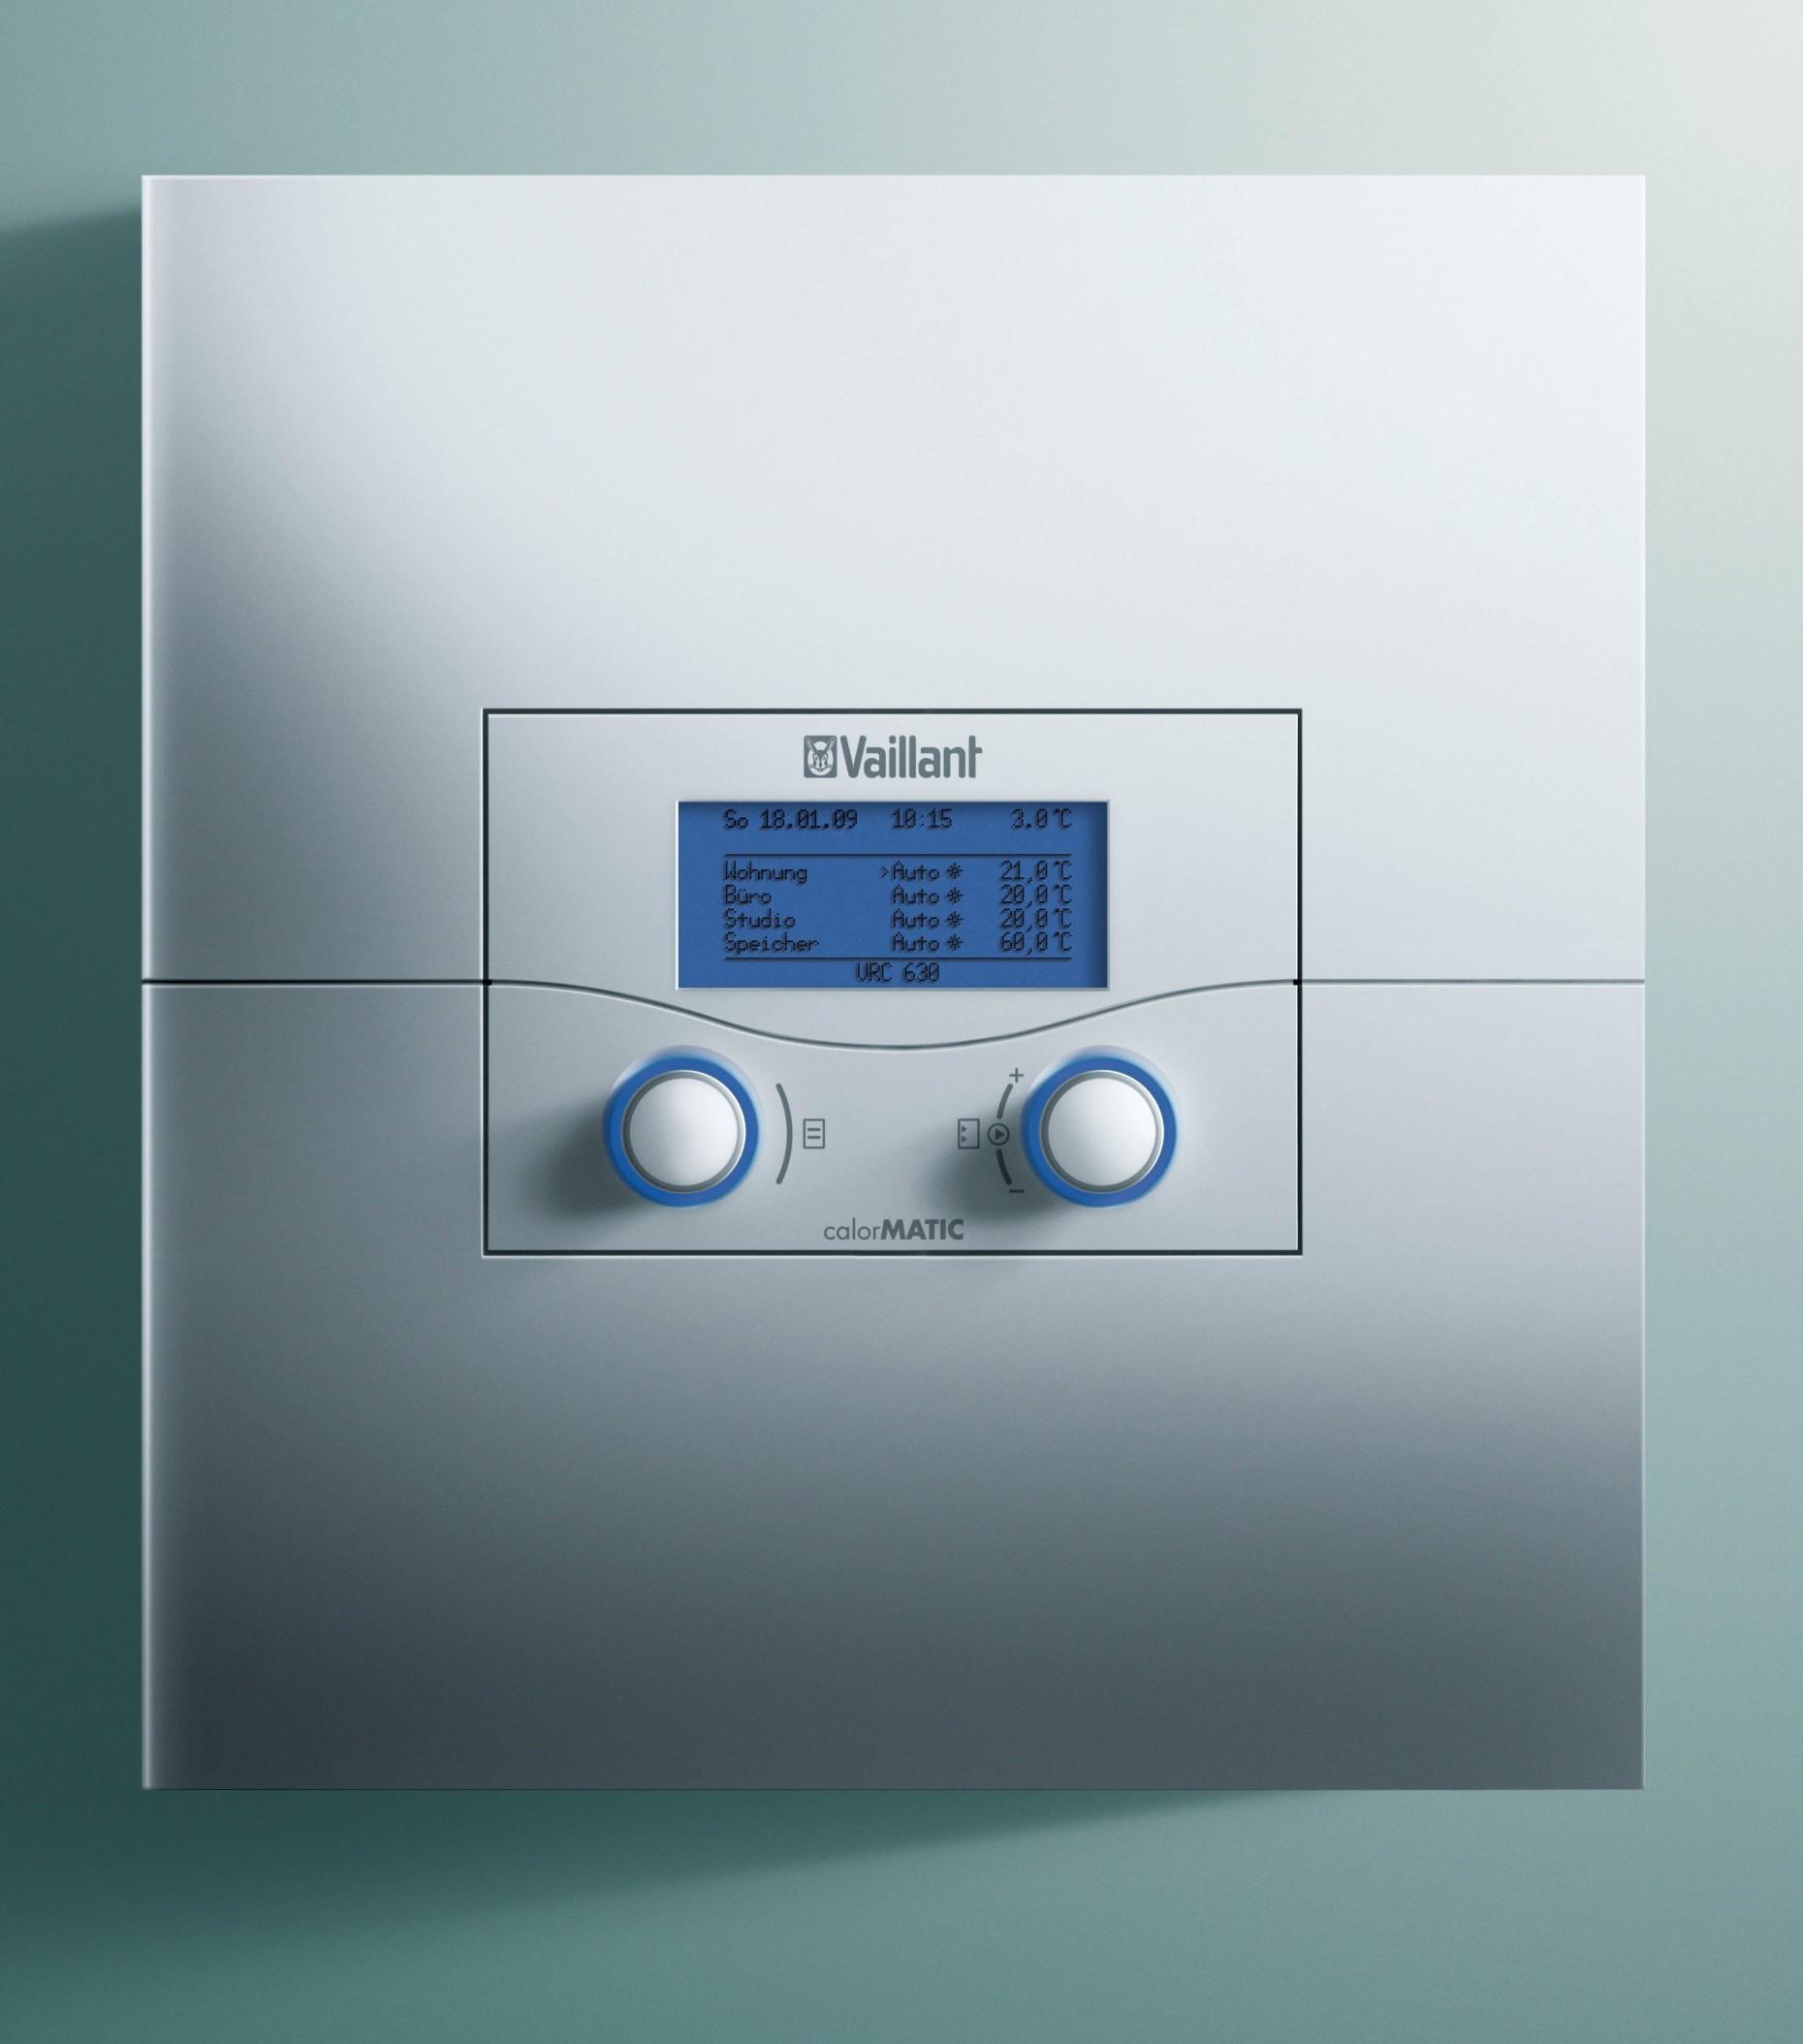 regelungssystem calormatic 630 3 vaillant. Black Bedroom Furniture Sets. Home Design Ideas